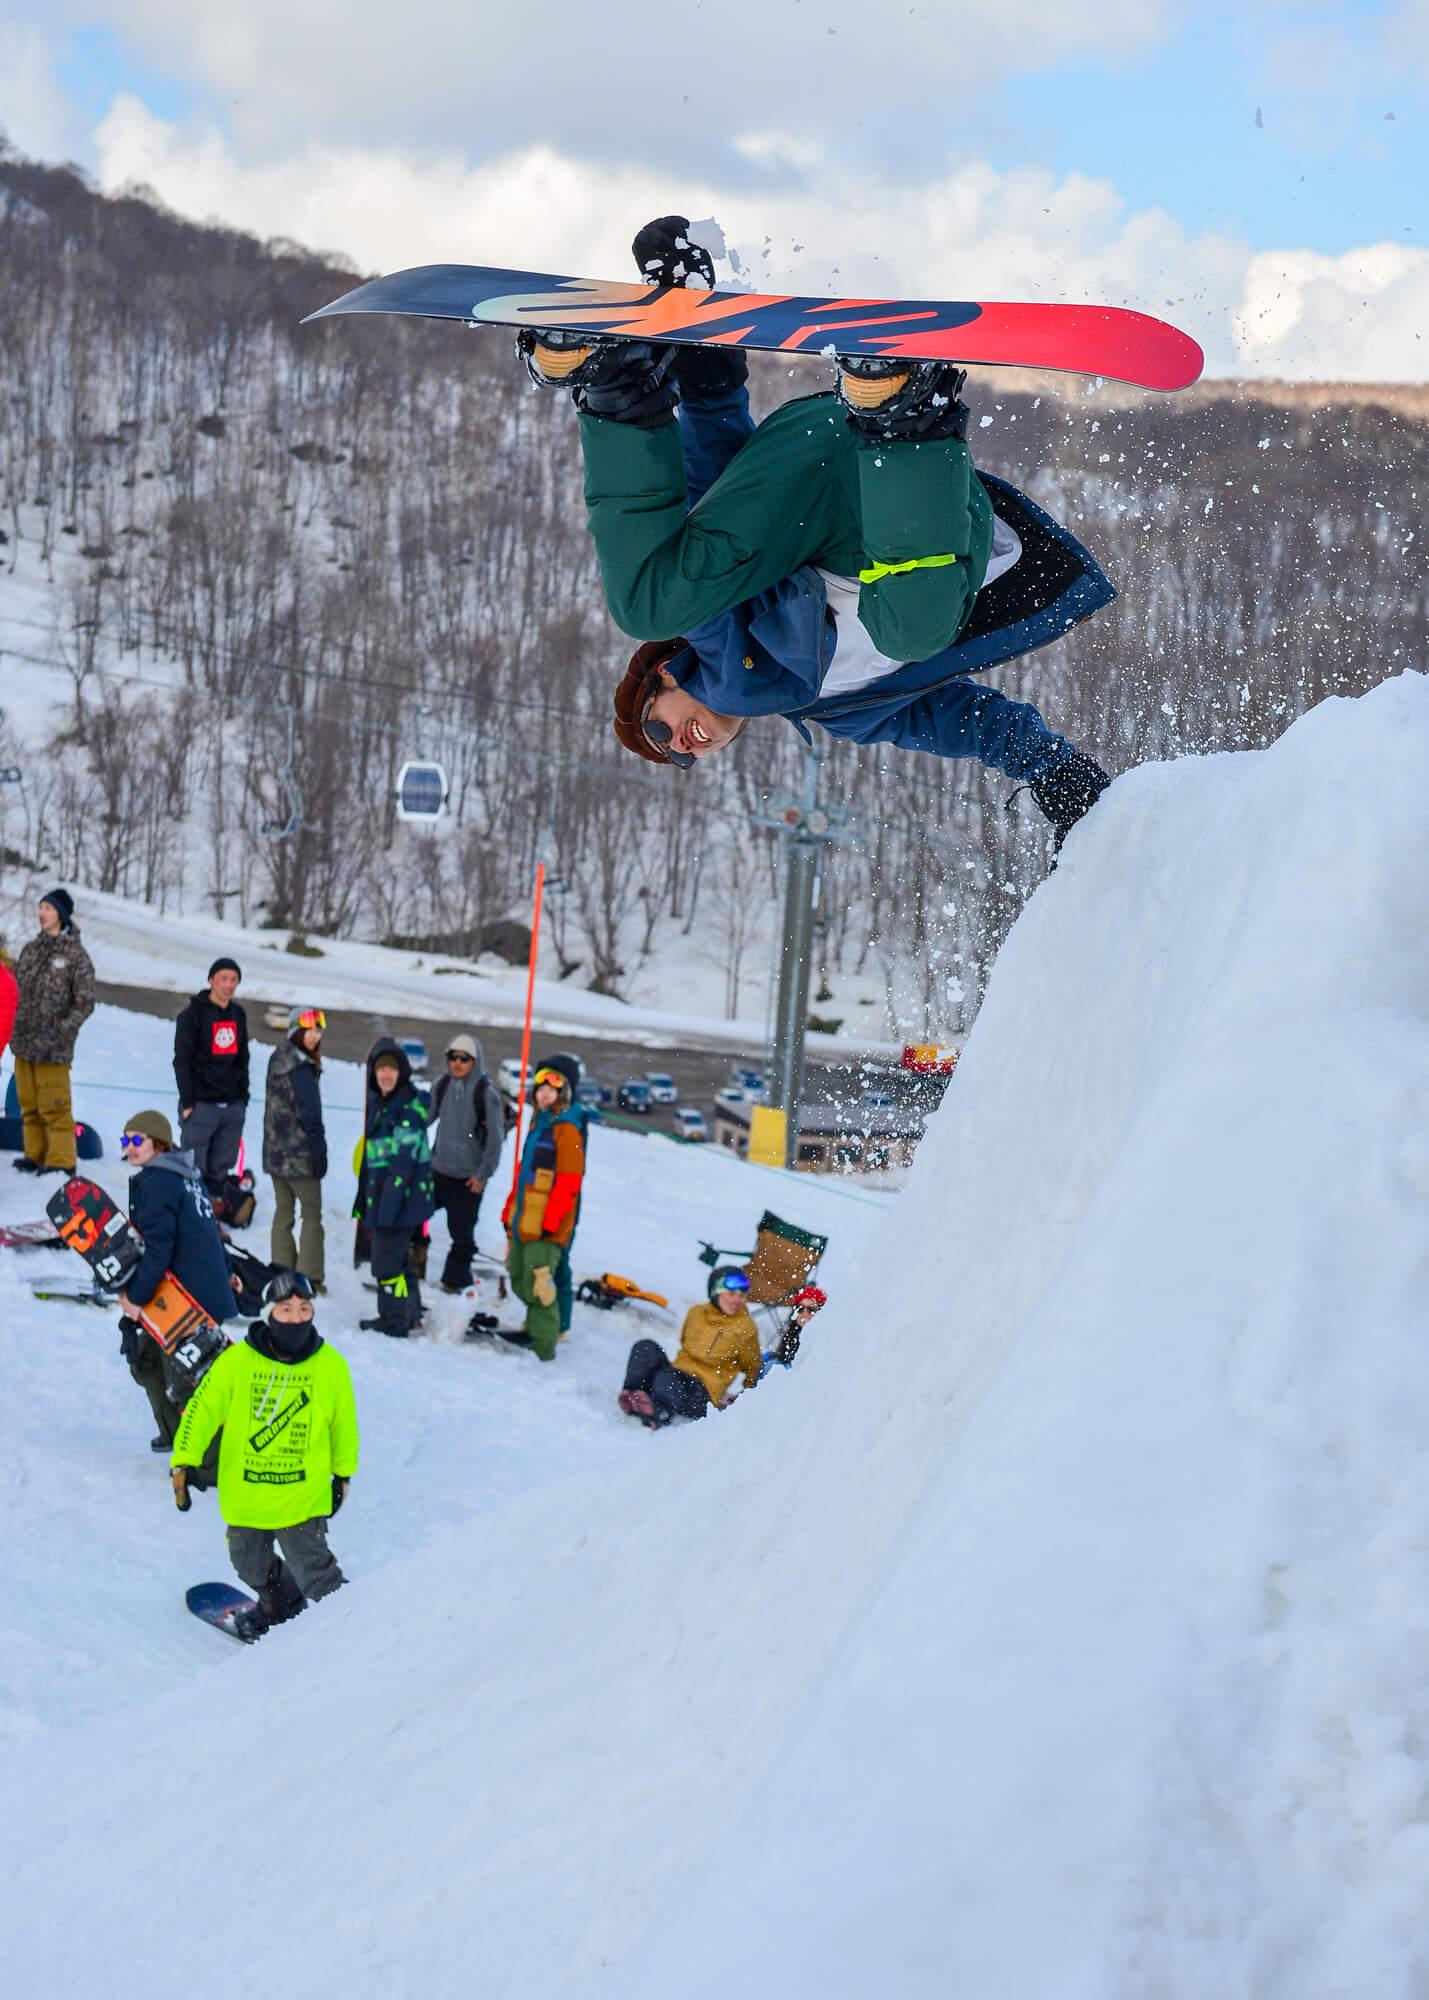 渡辺大介 K2 Snowboards